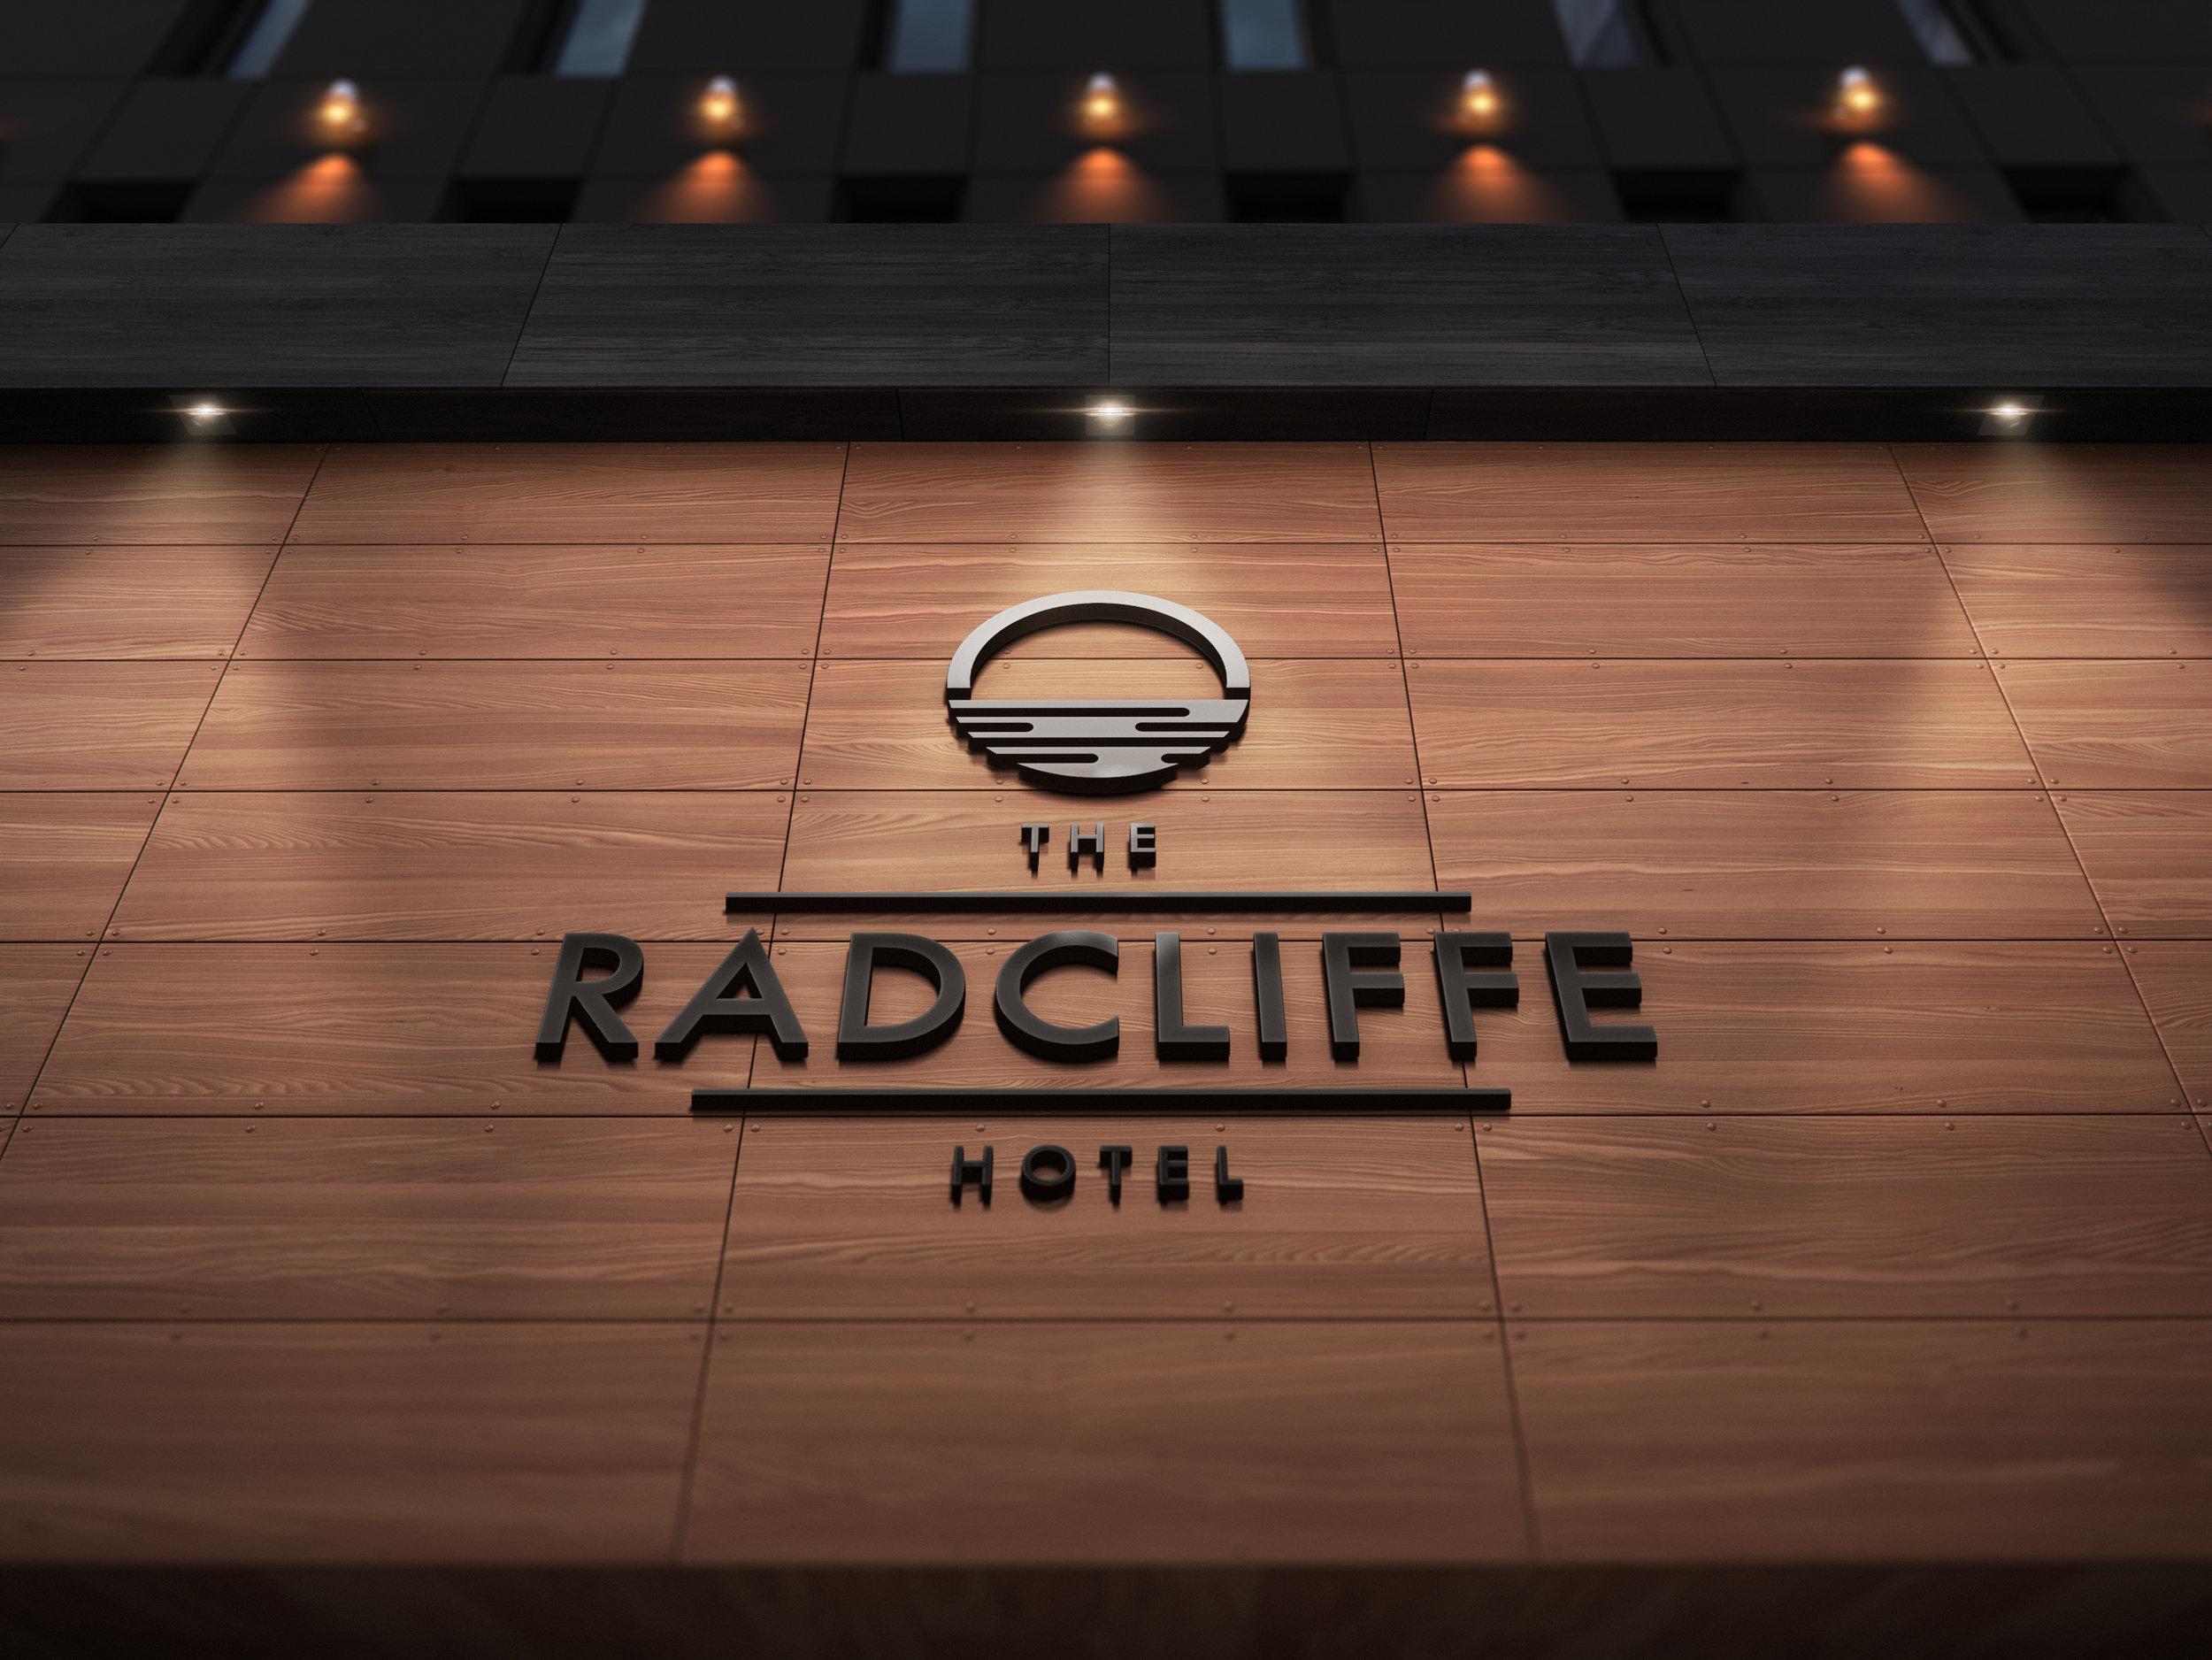 Radcliffe Hotel Brand Identity Thumbnail (1).jpg